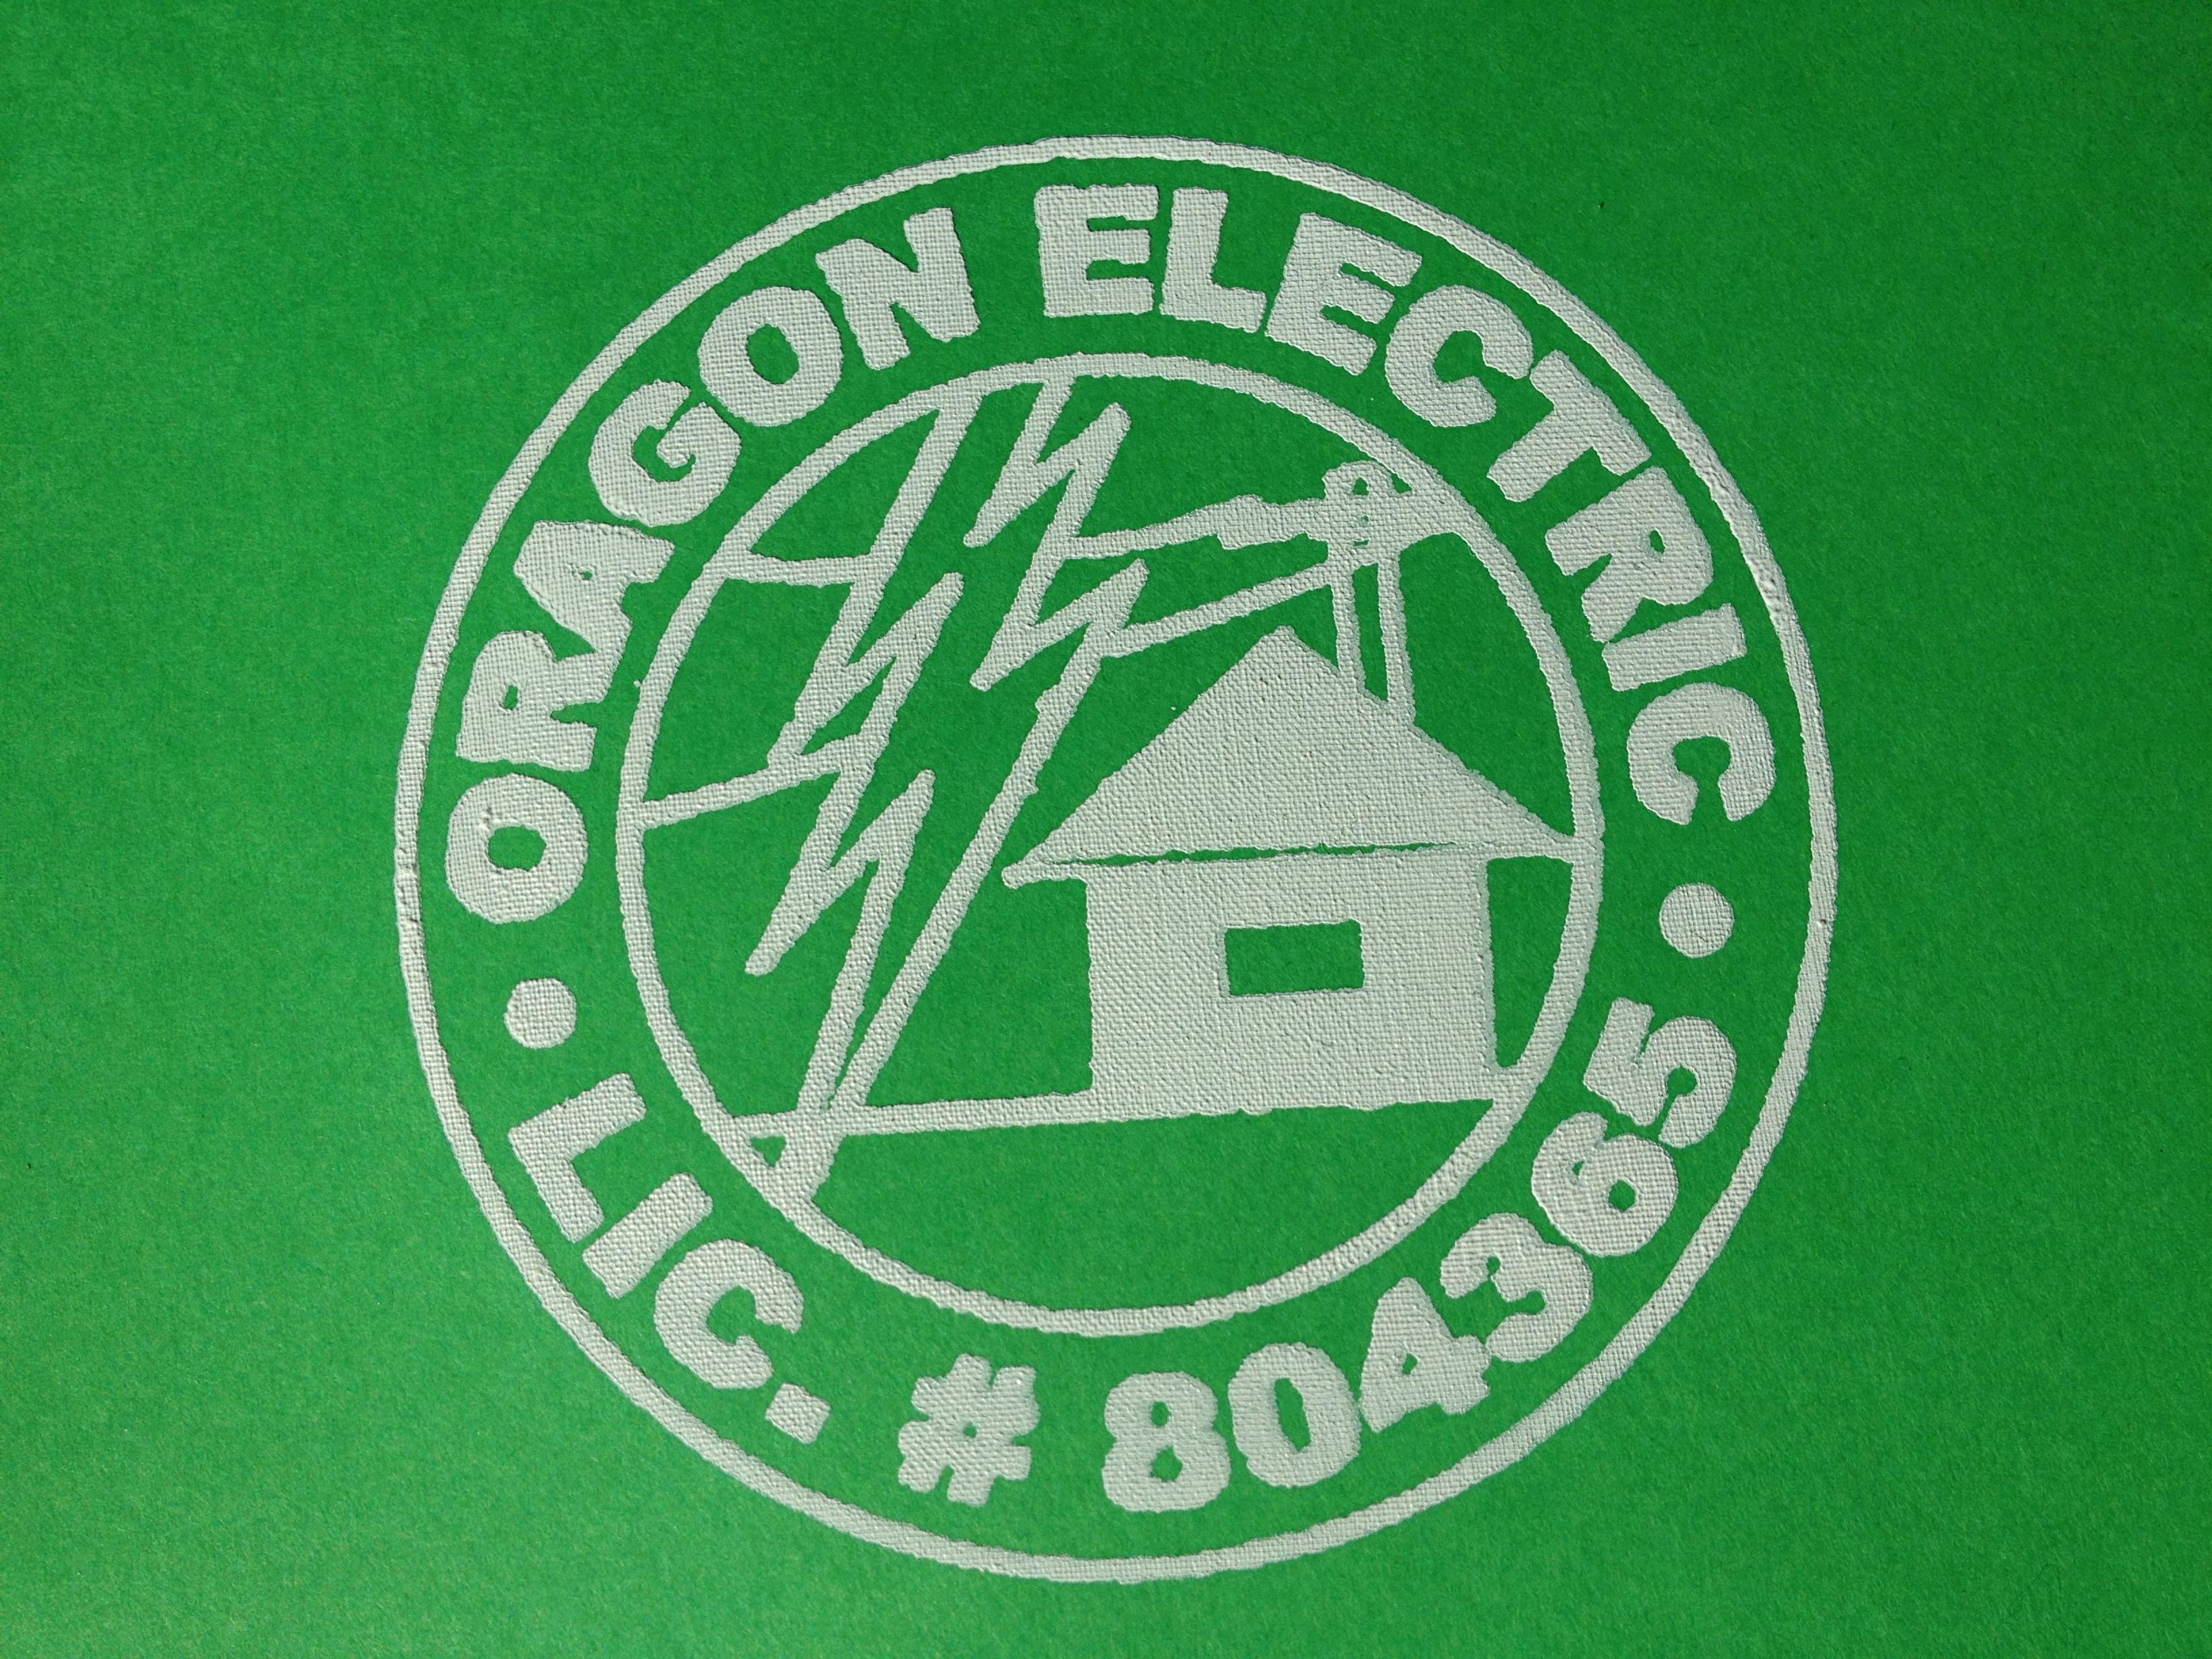 Oragon Electric